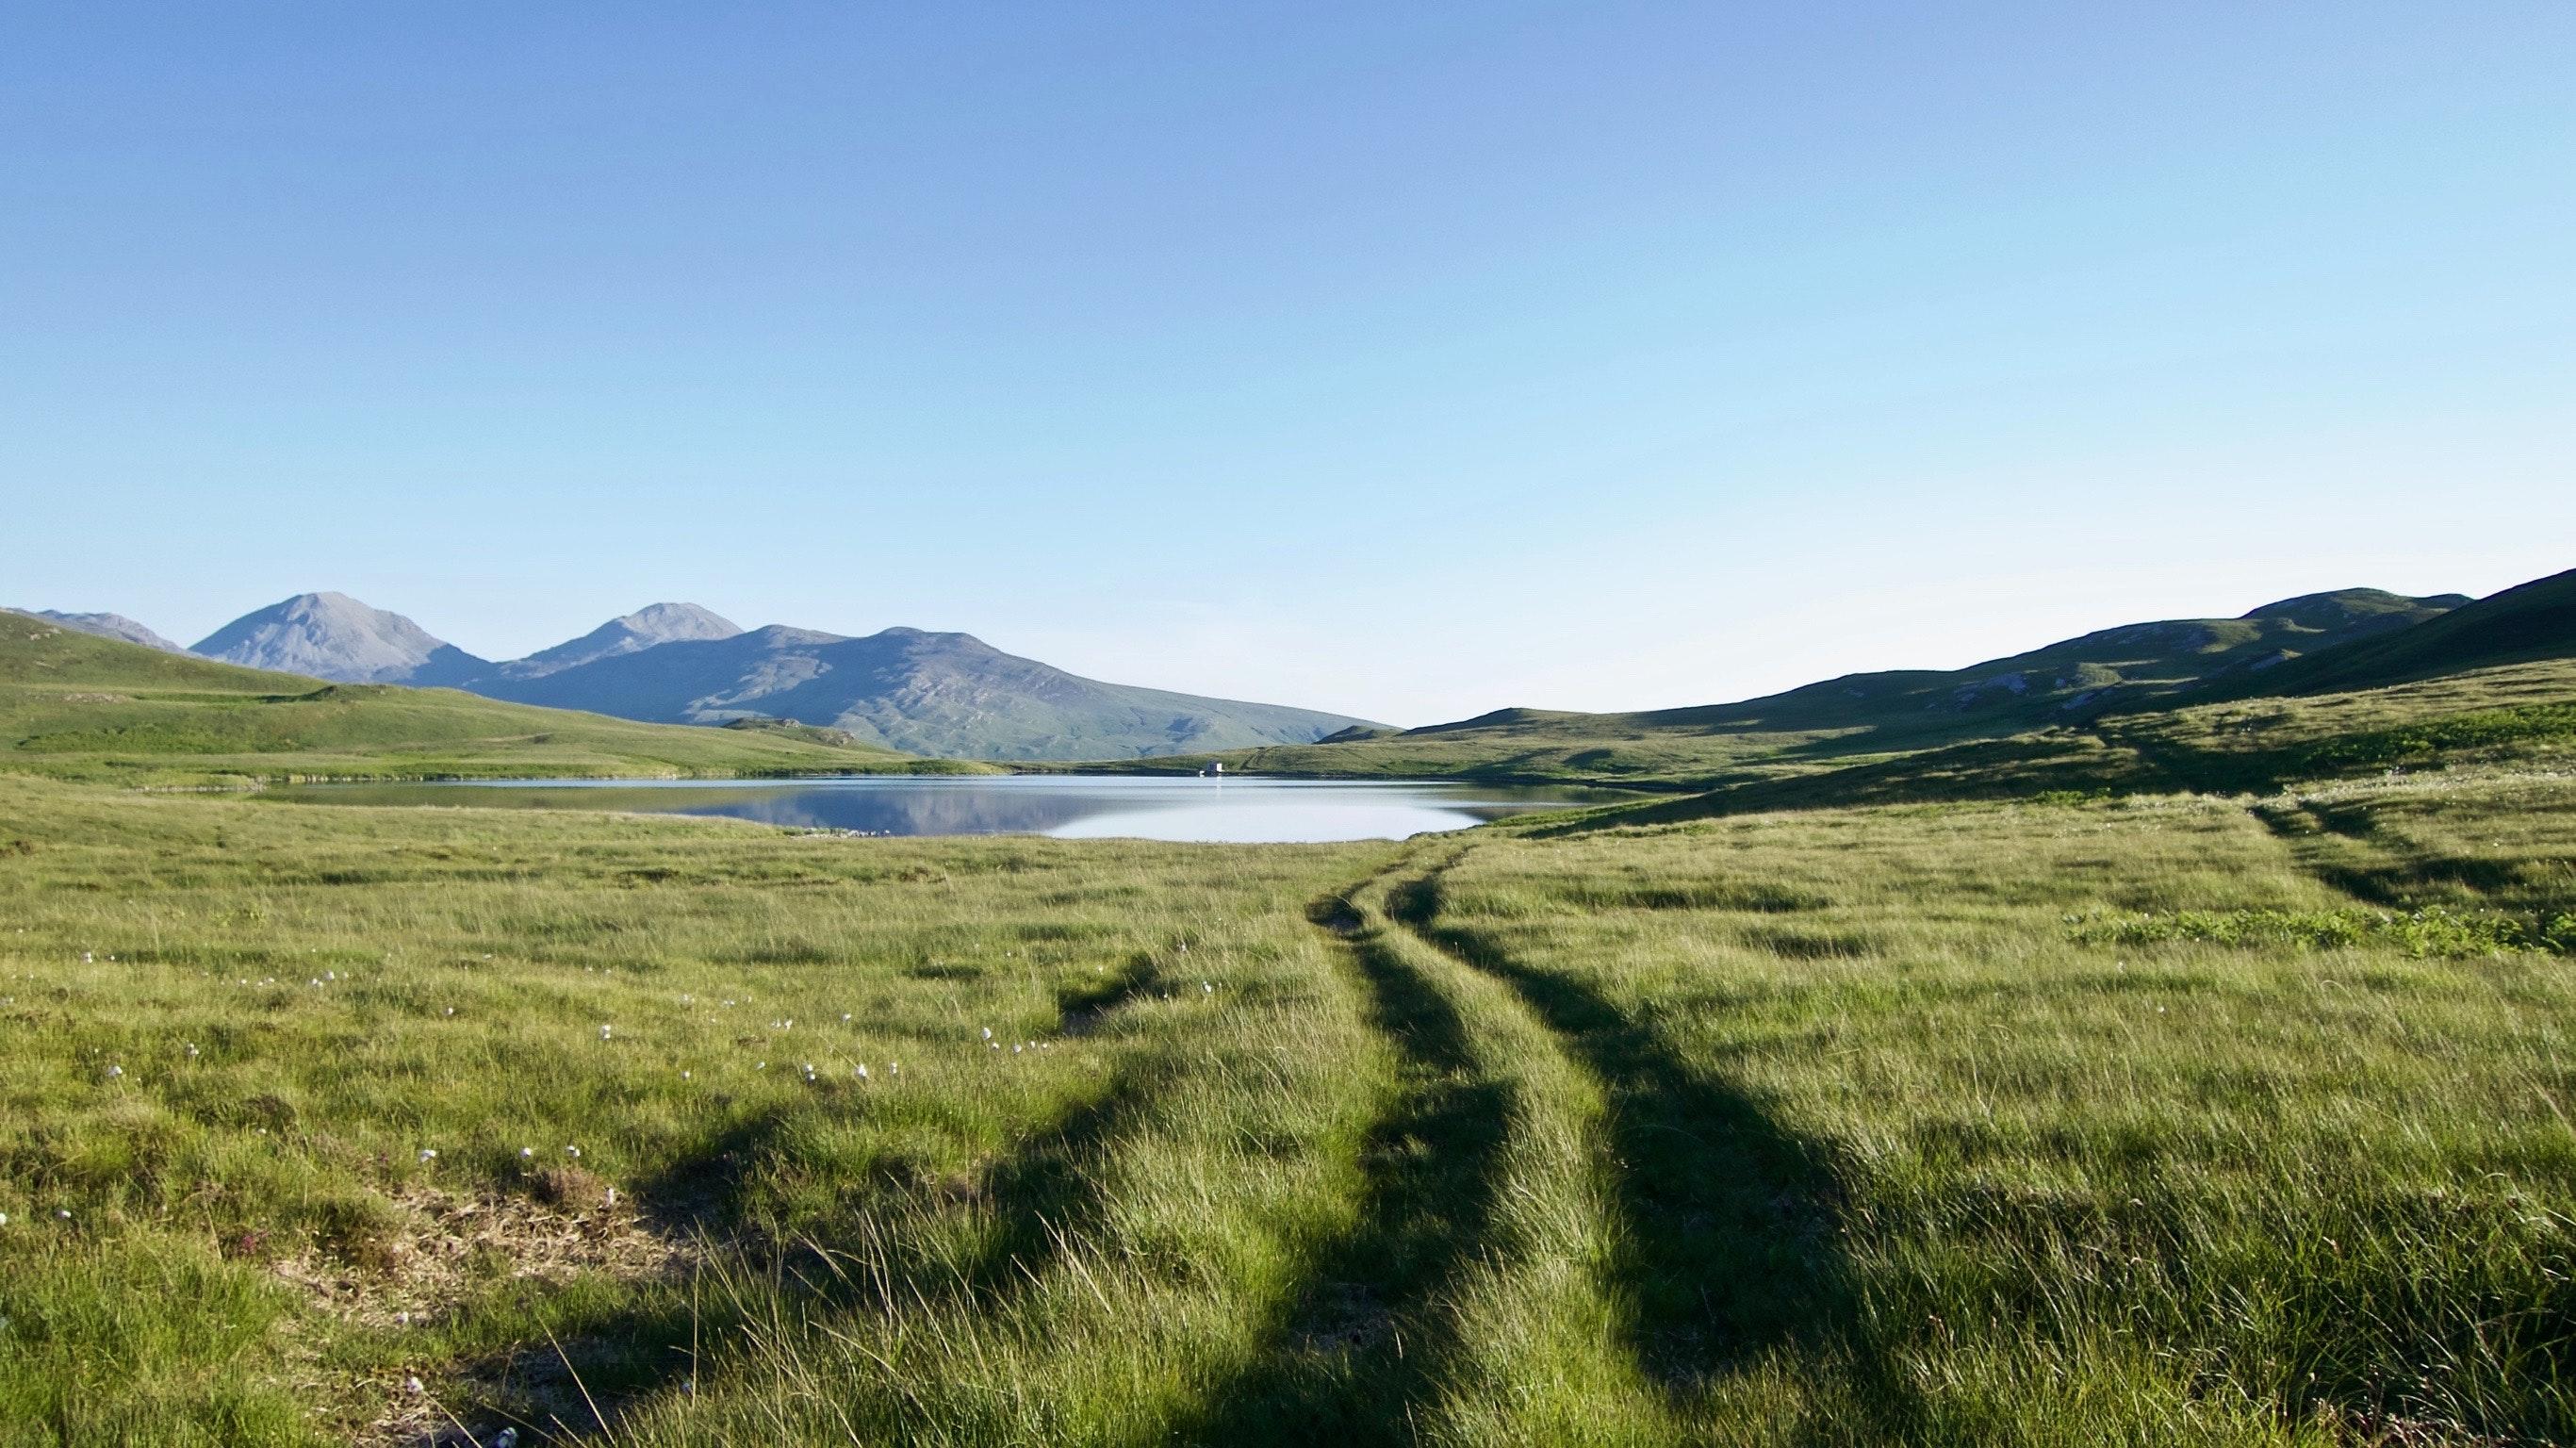 Loch Righ Beag